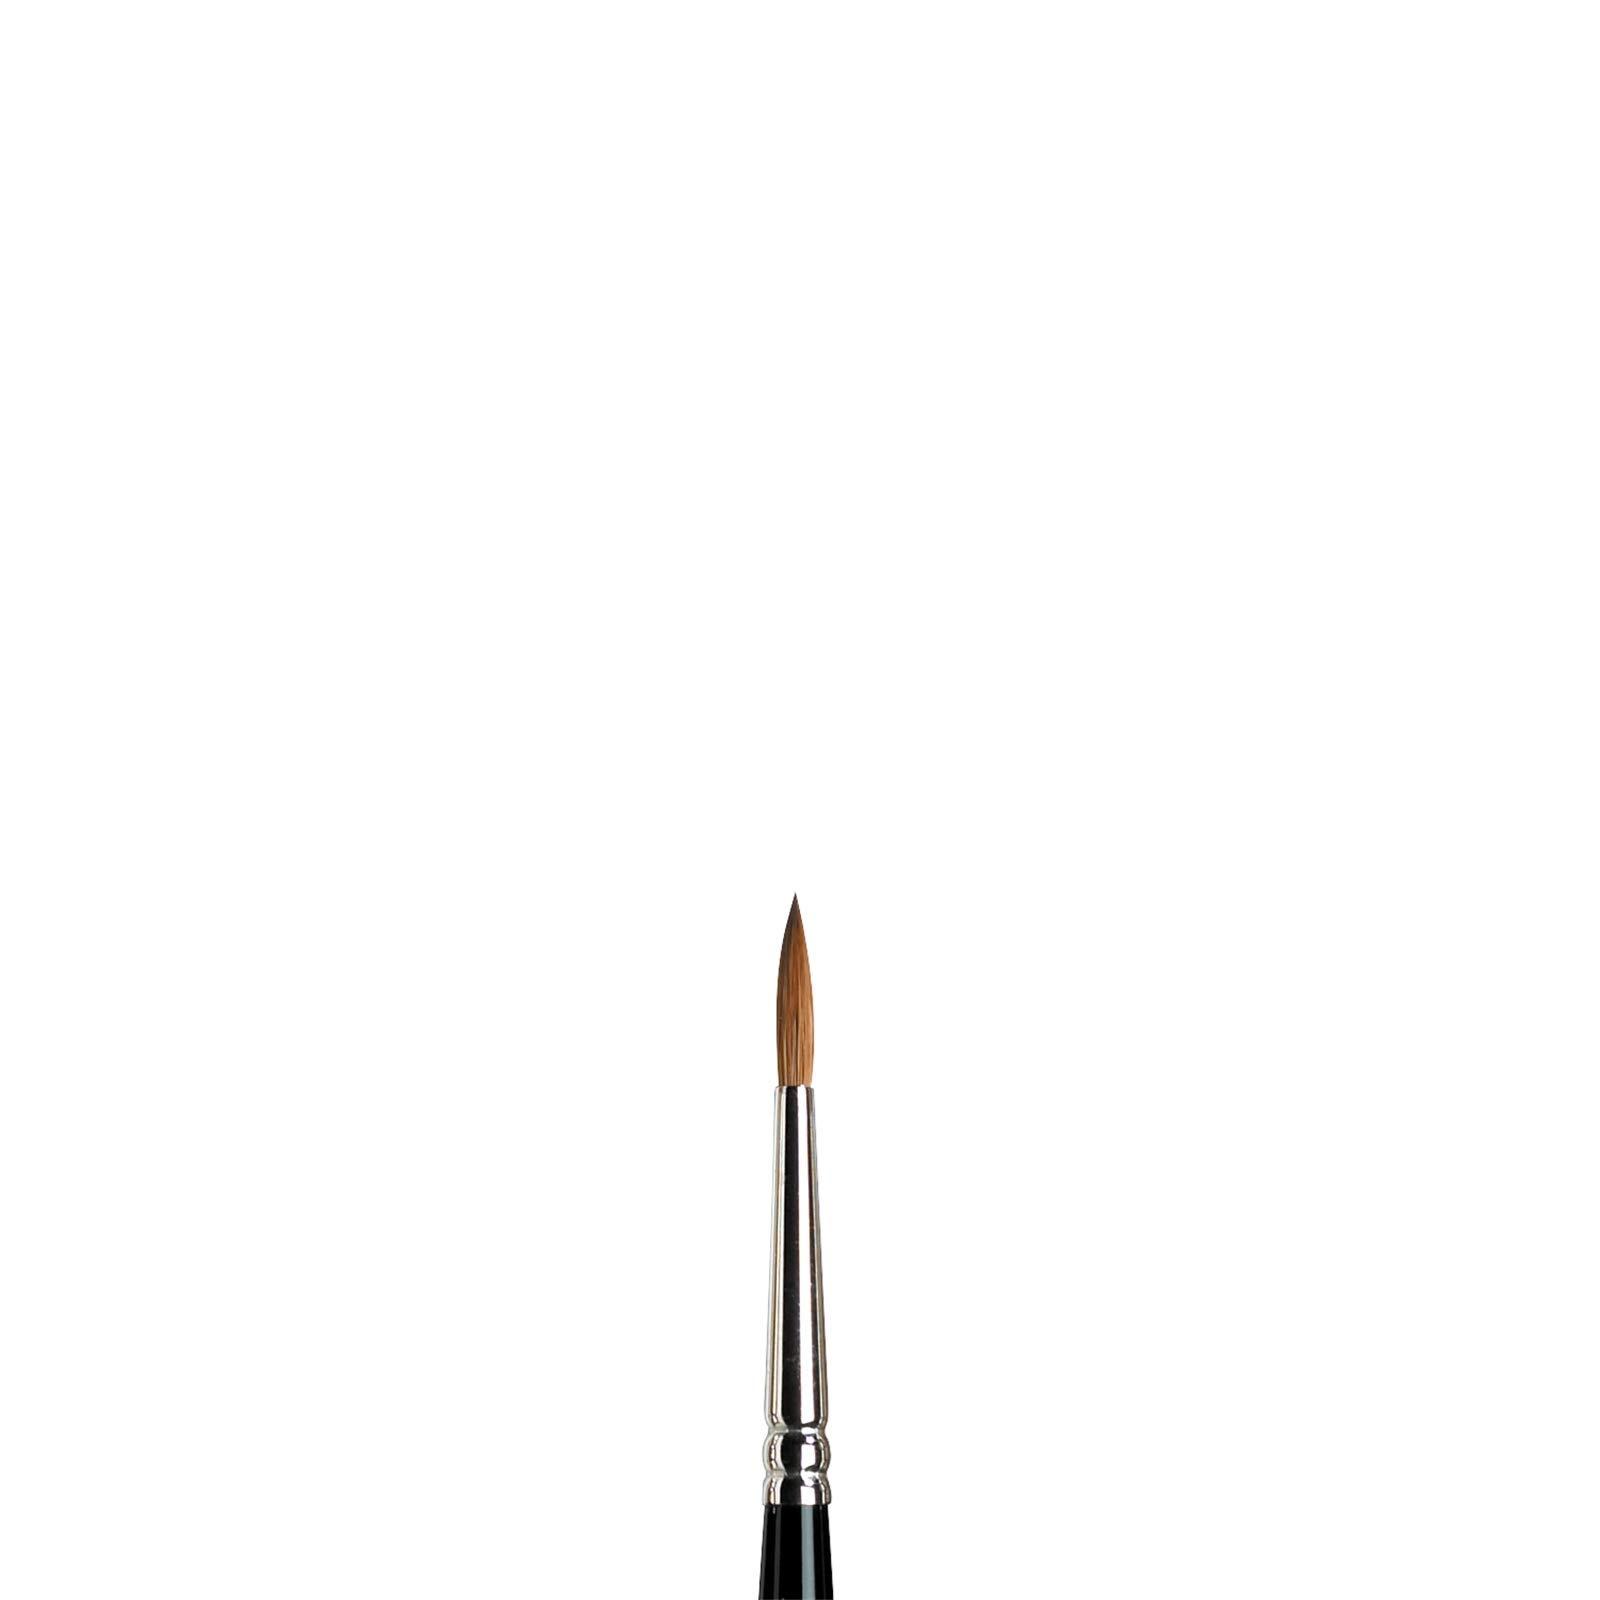 Winsor & Newton Series 7 Kolinsky Sable Watercolor Brush - Round #3 by Winsor & Newton